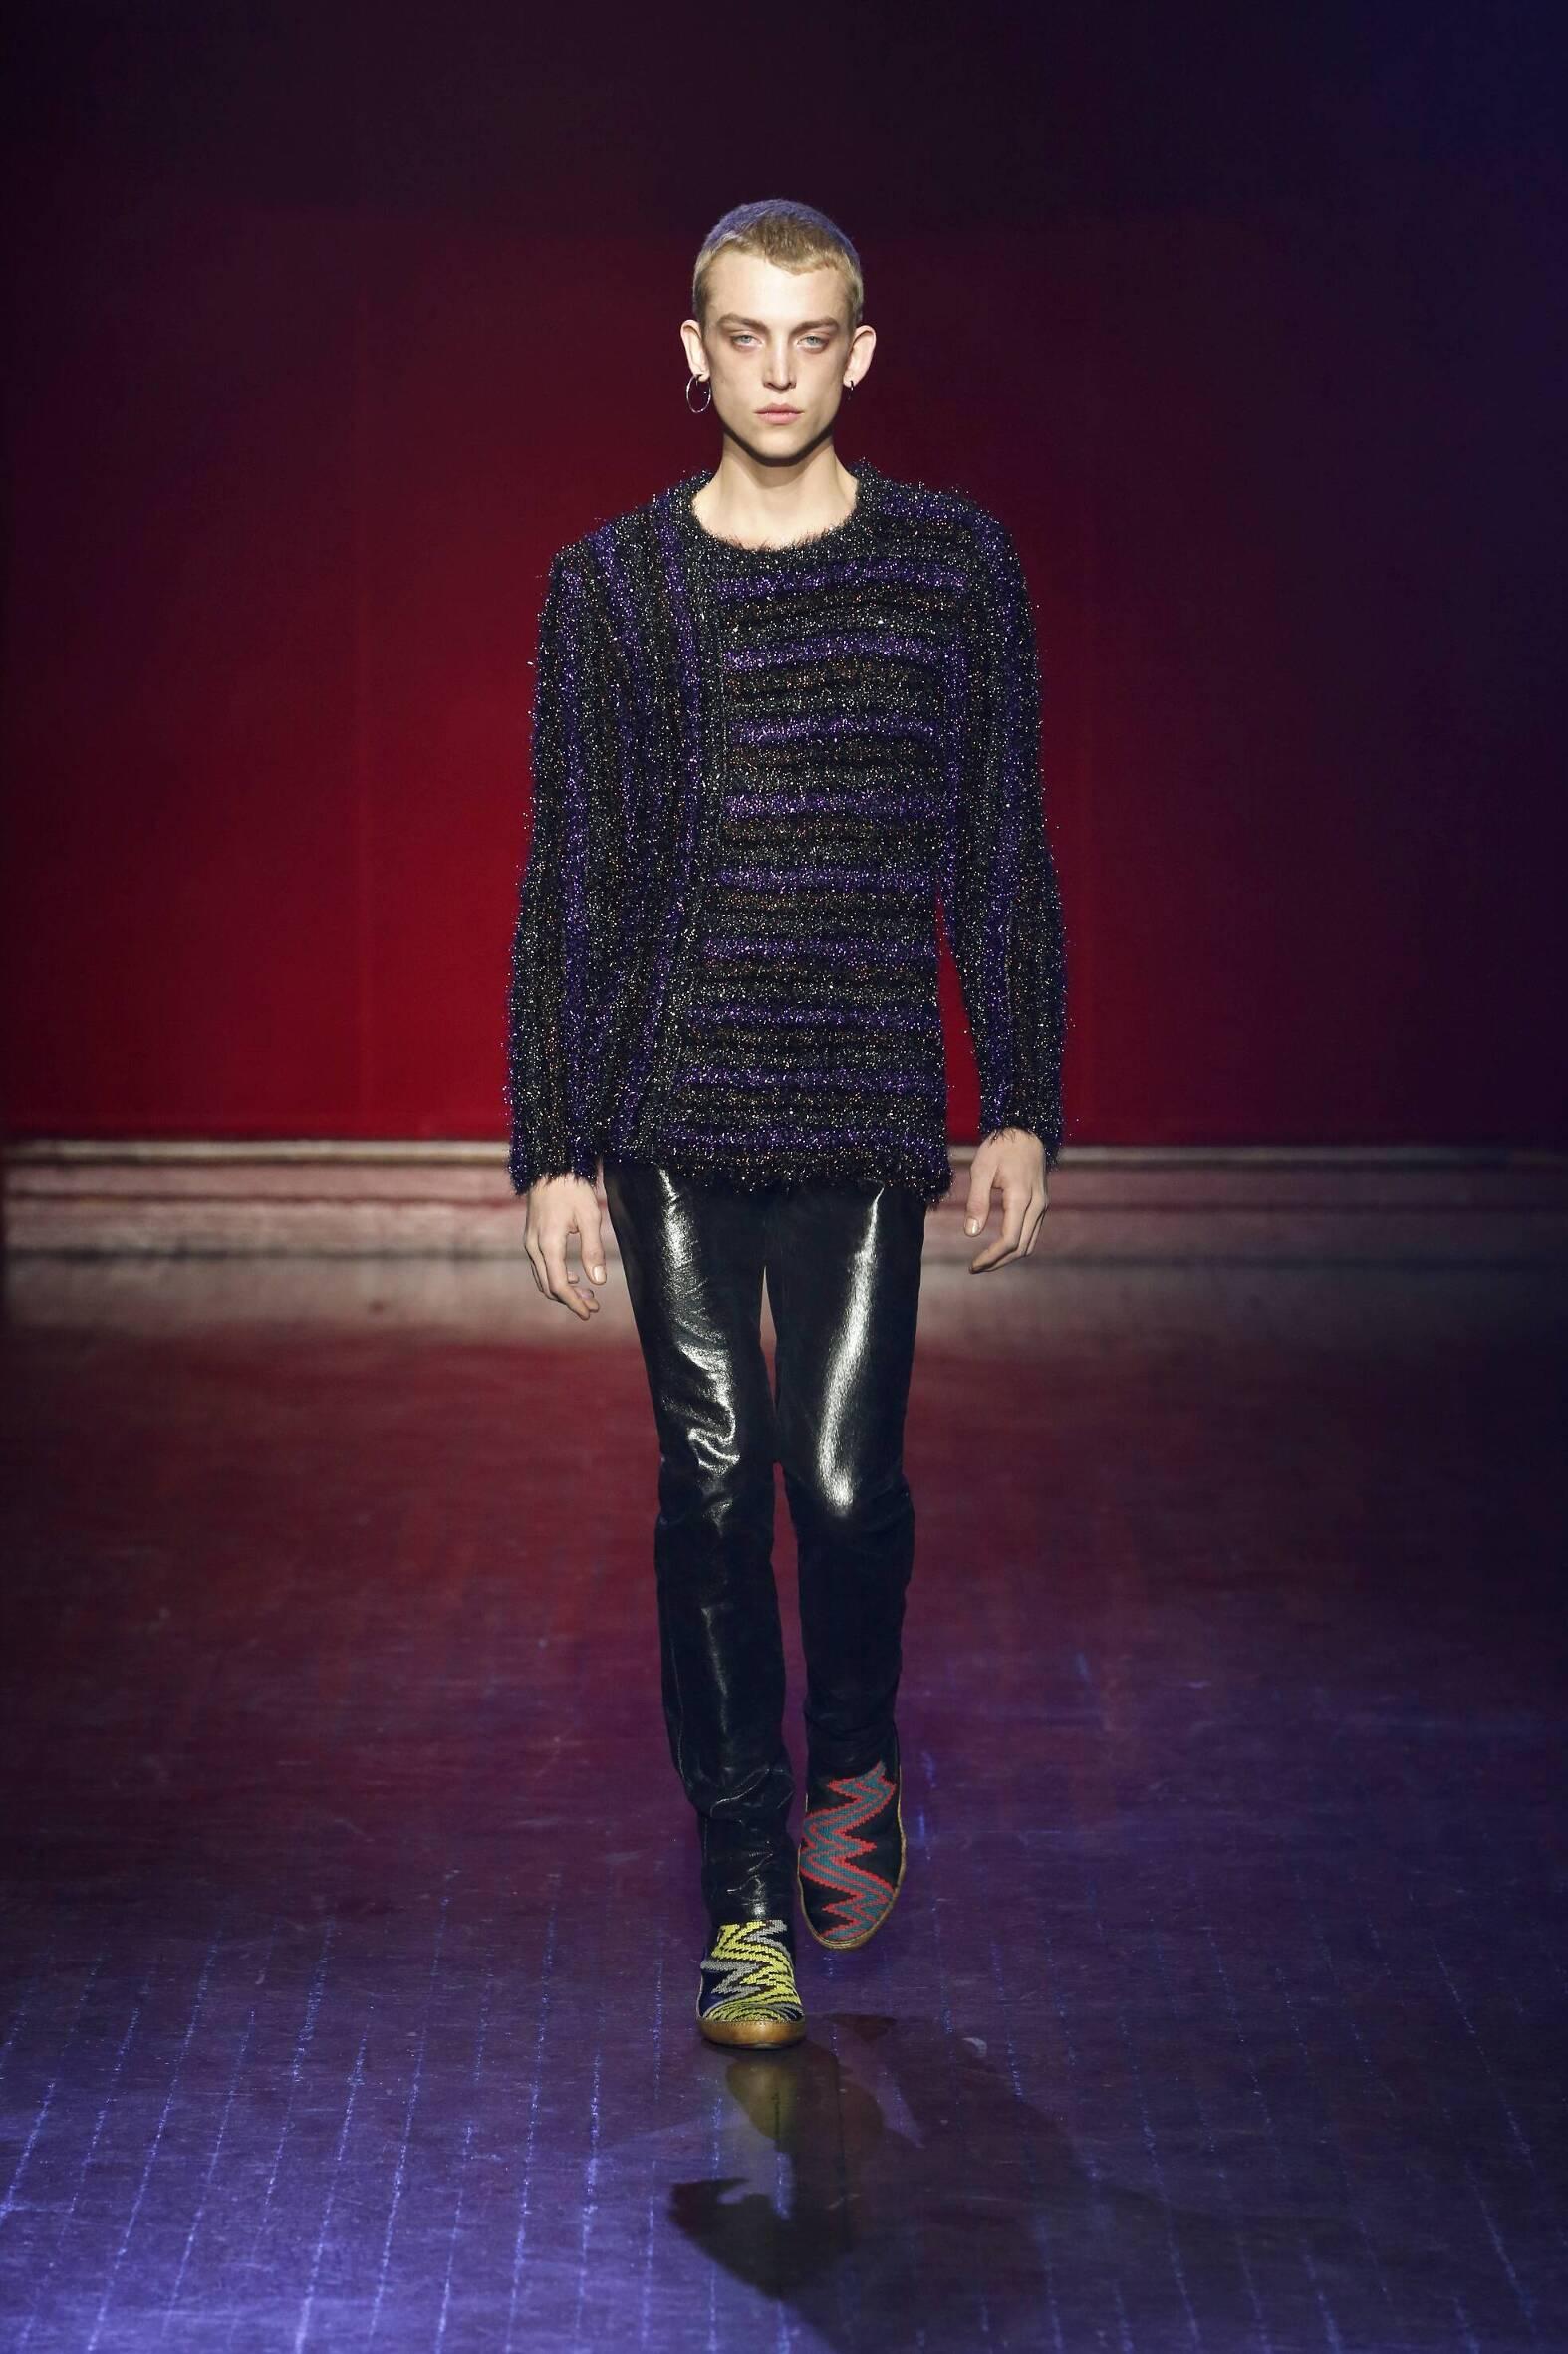 Maison Margiela Collection Winter 2015 Catwalk